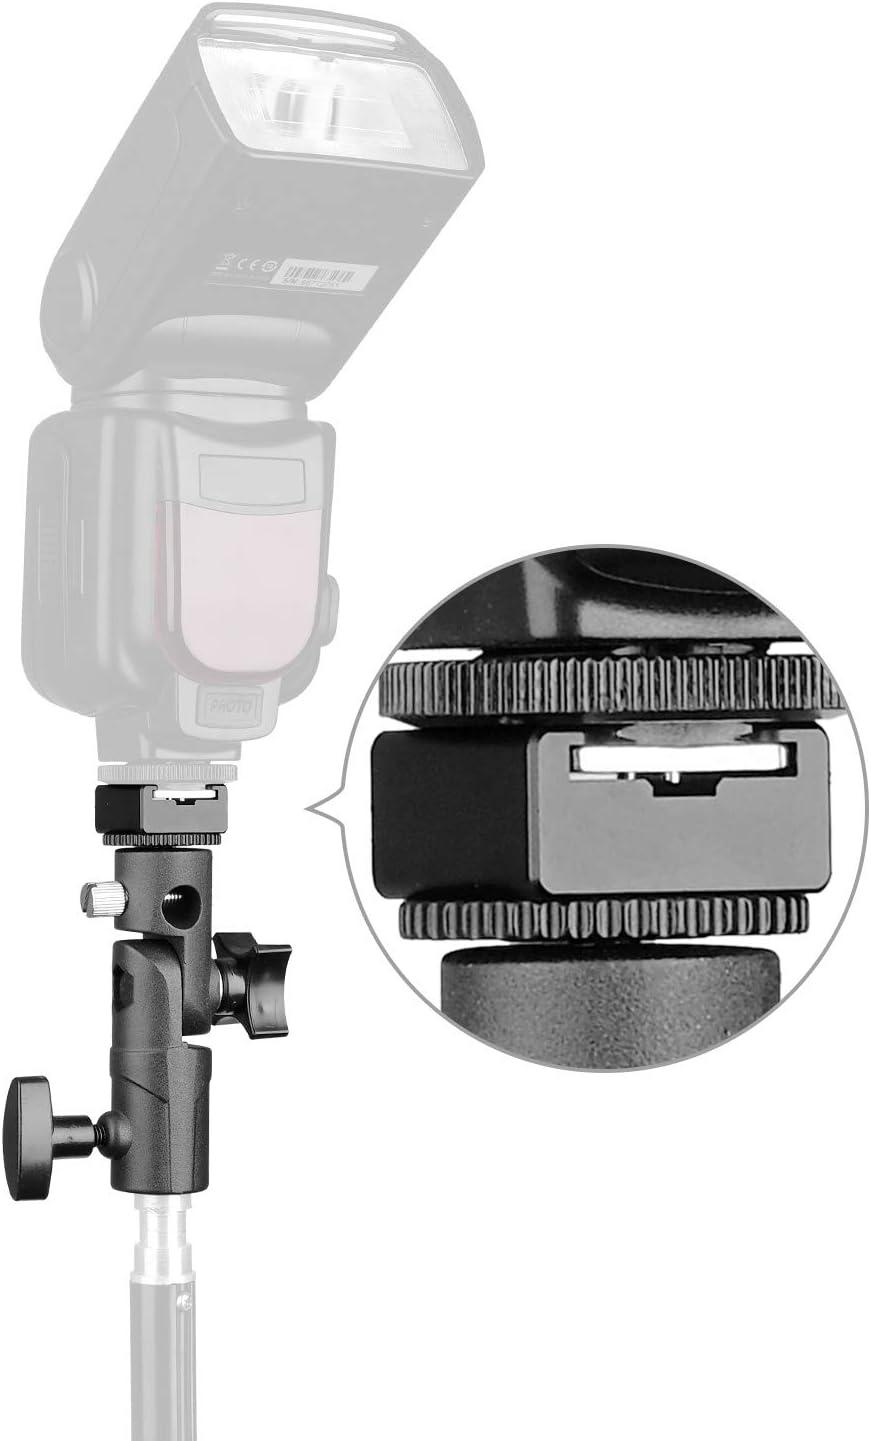 2Pack Anwenk Camera Flash Speedlite Mount Swivel Light Stand Bracket with Umbrella Reflector Holder for Camera DSLR Nikon Canon Pentax Olympus and Other DSLR Flashes Studio Light LED Light